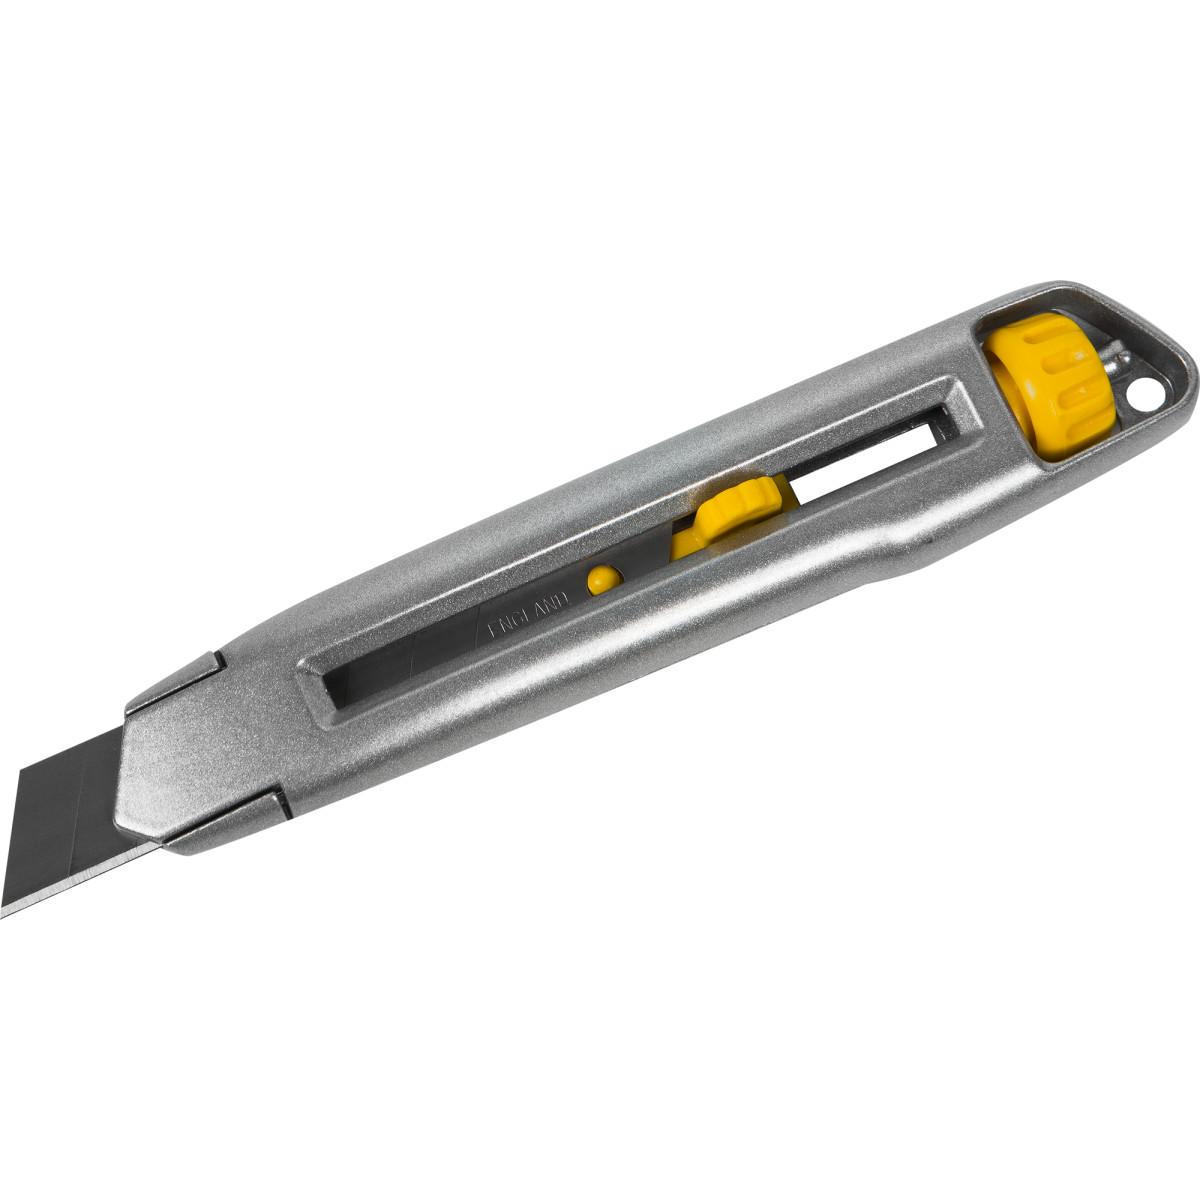 Нож Stanley Interlock 18 мм